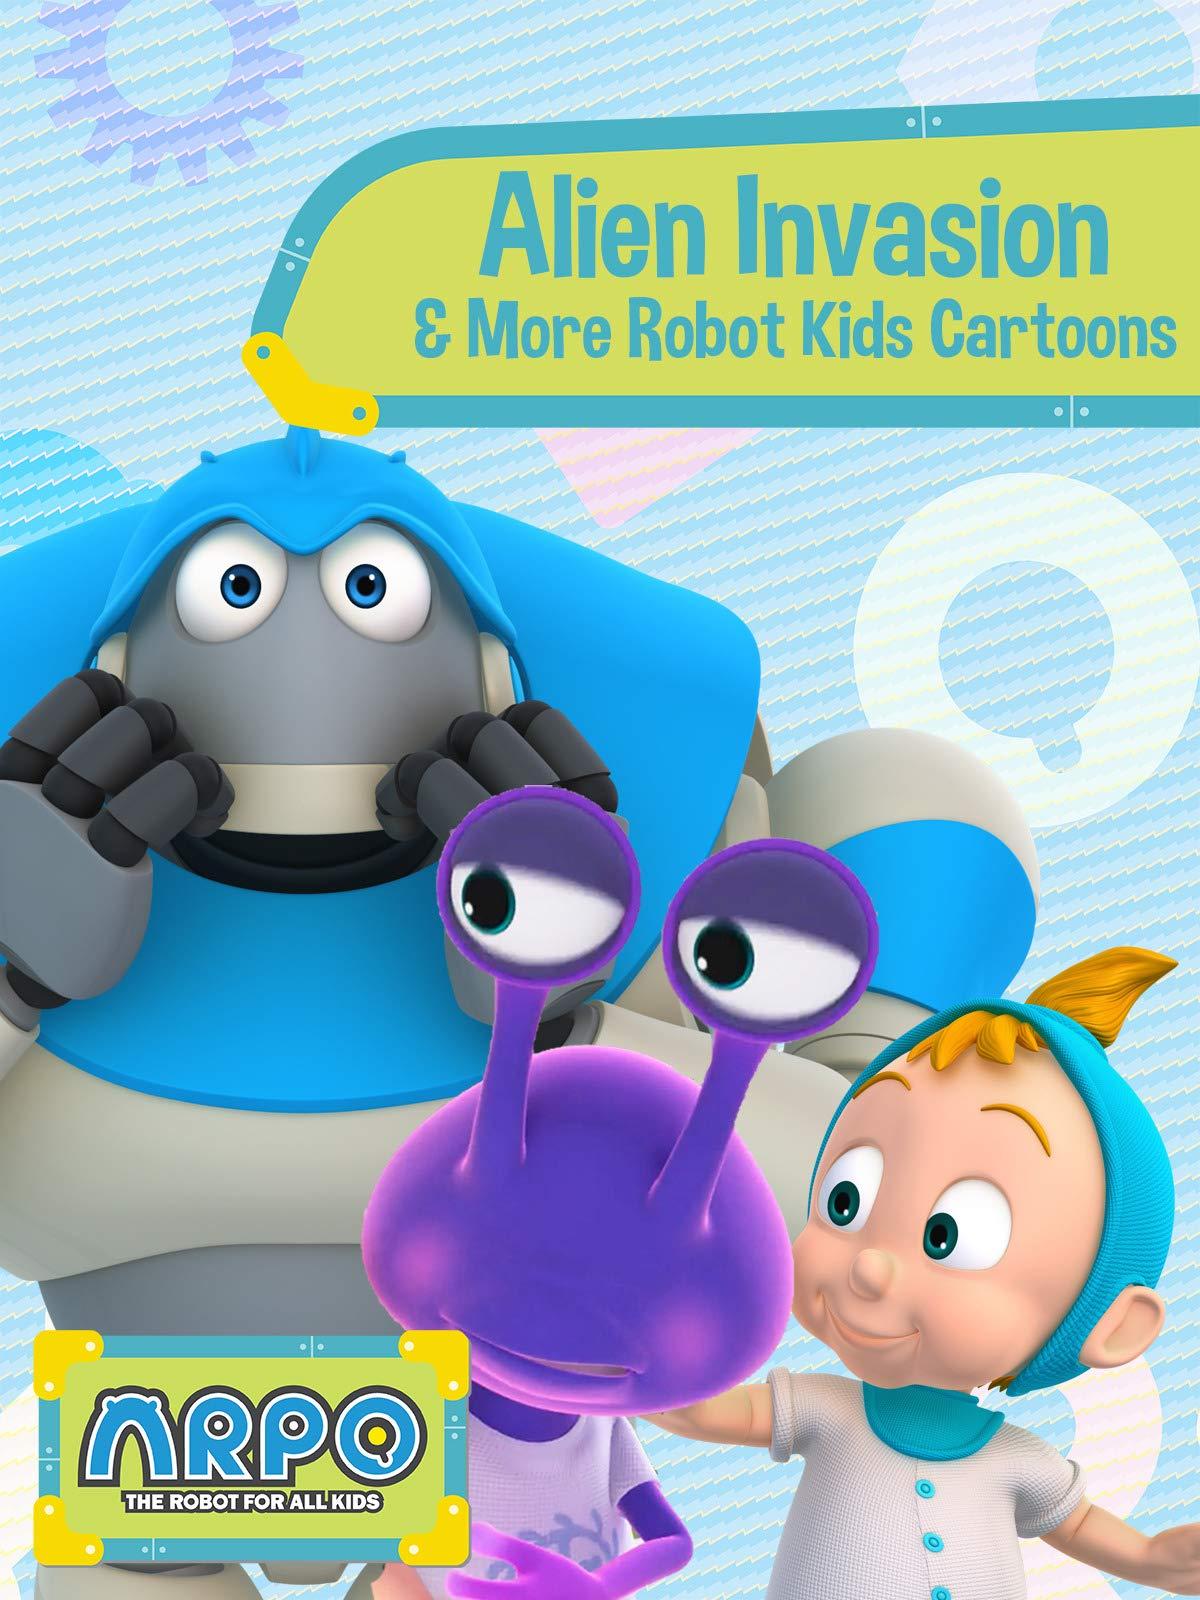 Arpo the Robot for All Kids - Alien Invasion & More Robot Kids Cartoons